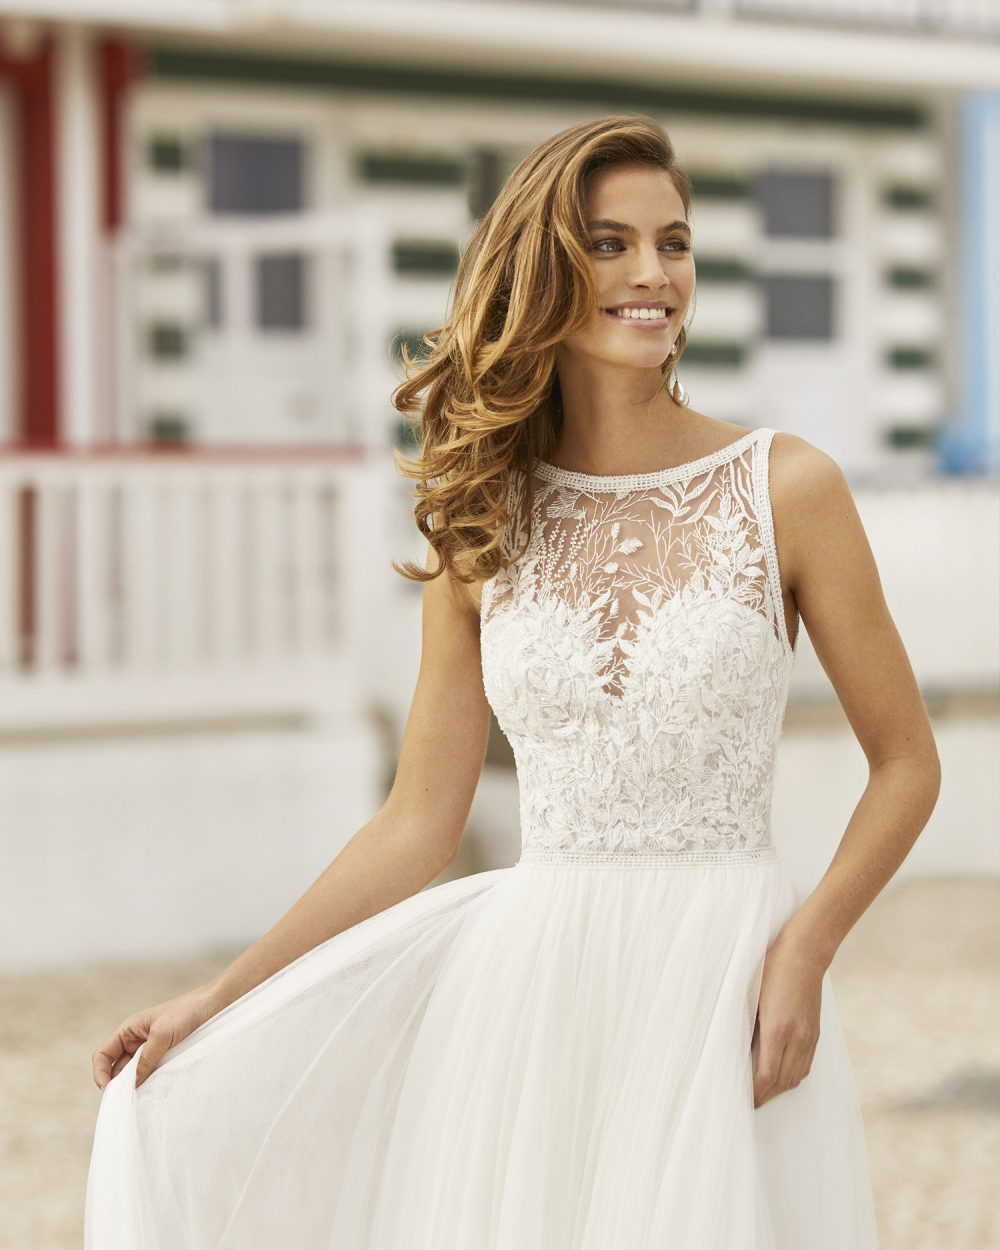 Mariages: abito da sposa Rosa Clarà 2021 a Vicenza, Verona, Padova, Veneto 5K109 HANIEL